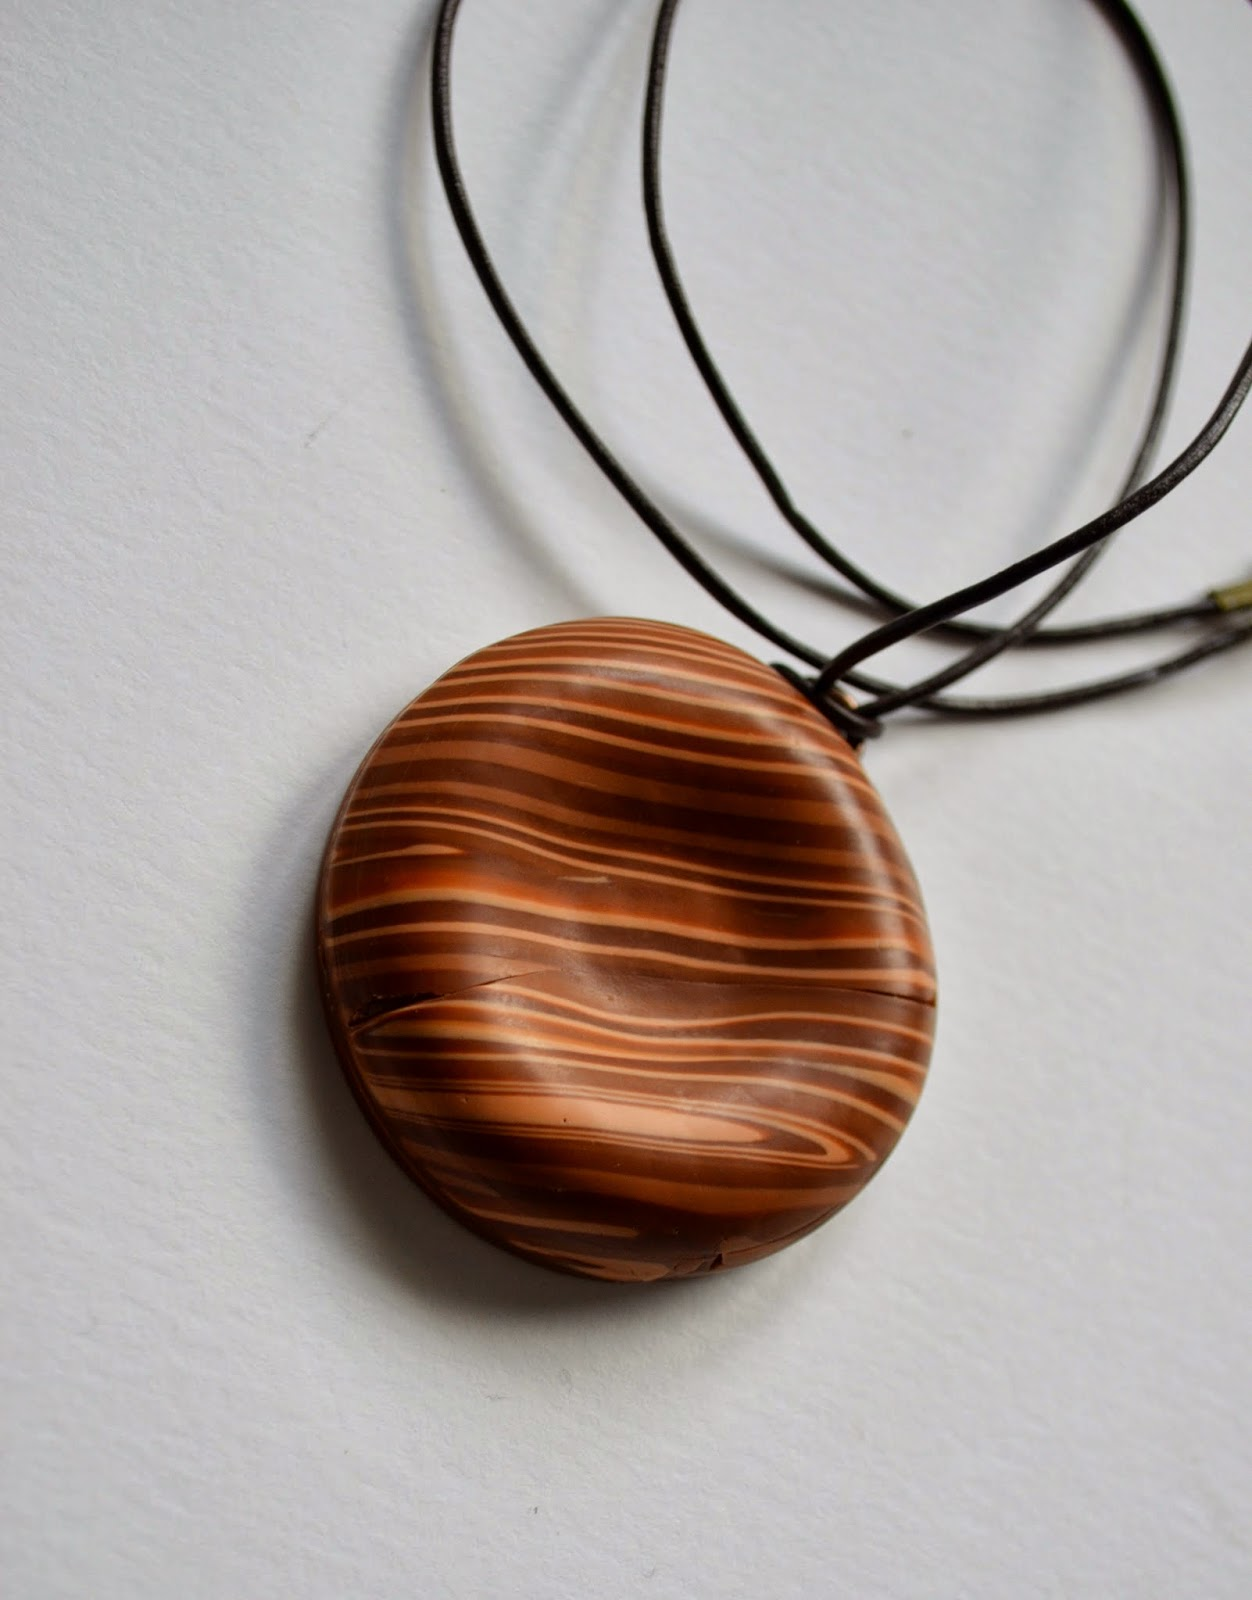 http://www.elrincondefrifri.com/2014/02/como-imitar-madera-con-arcilla.html